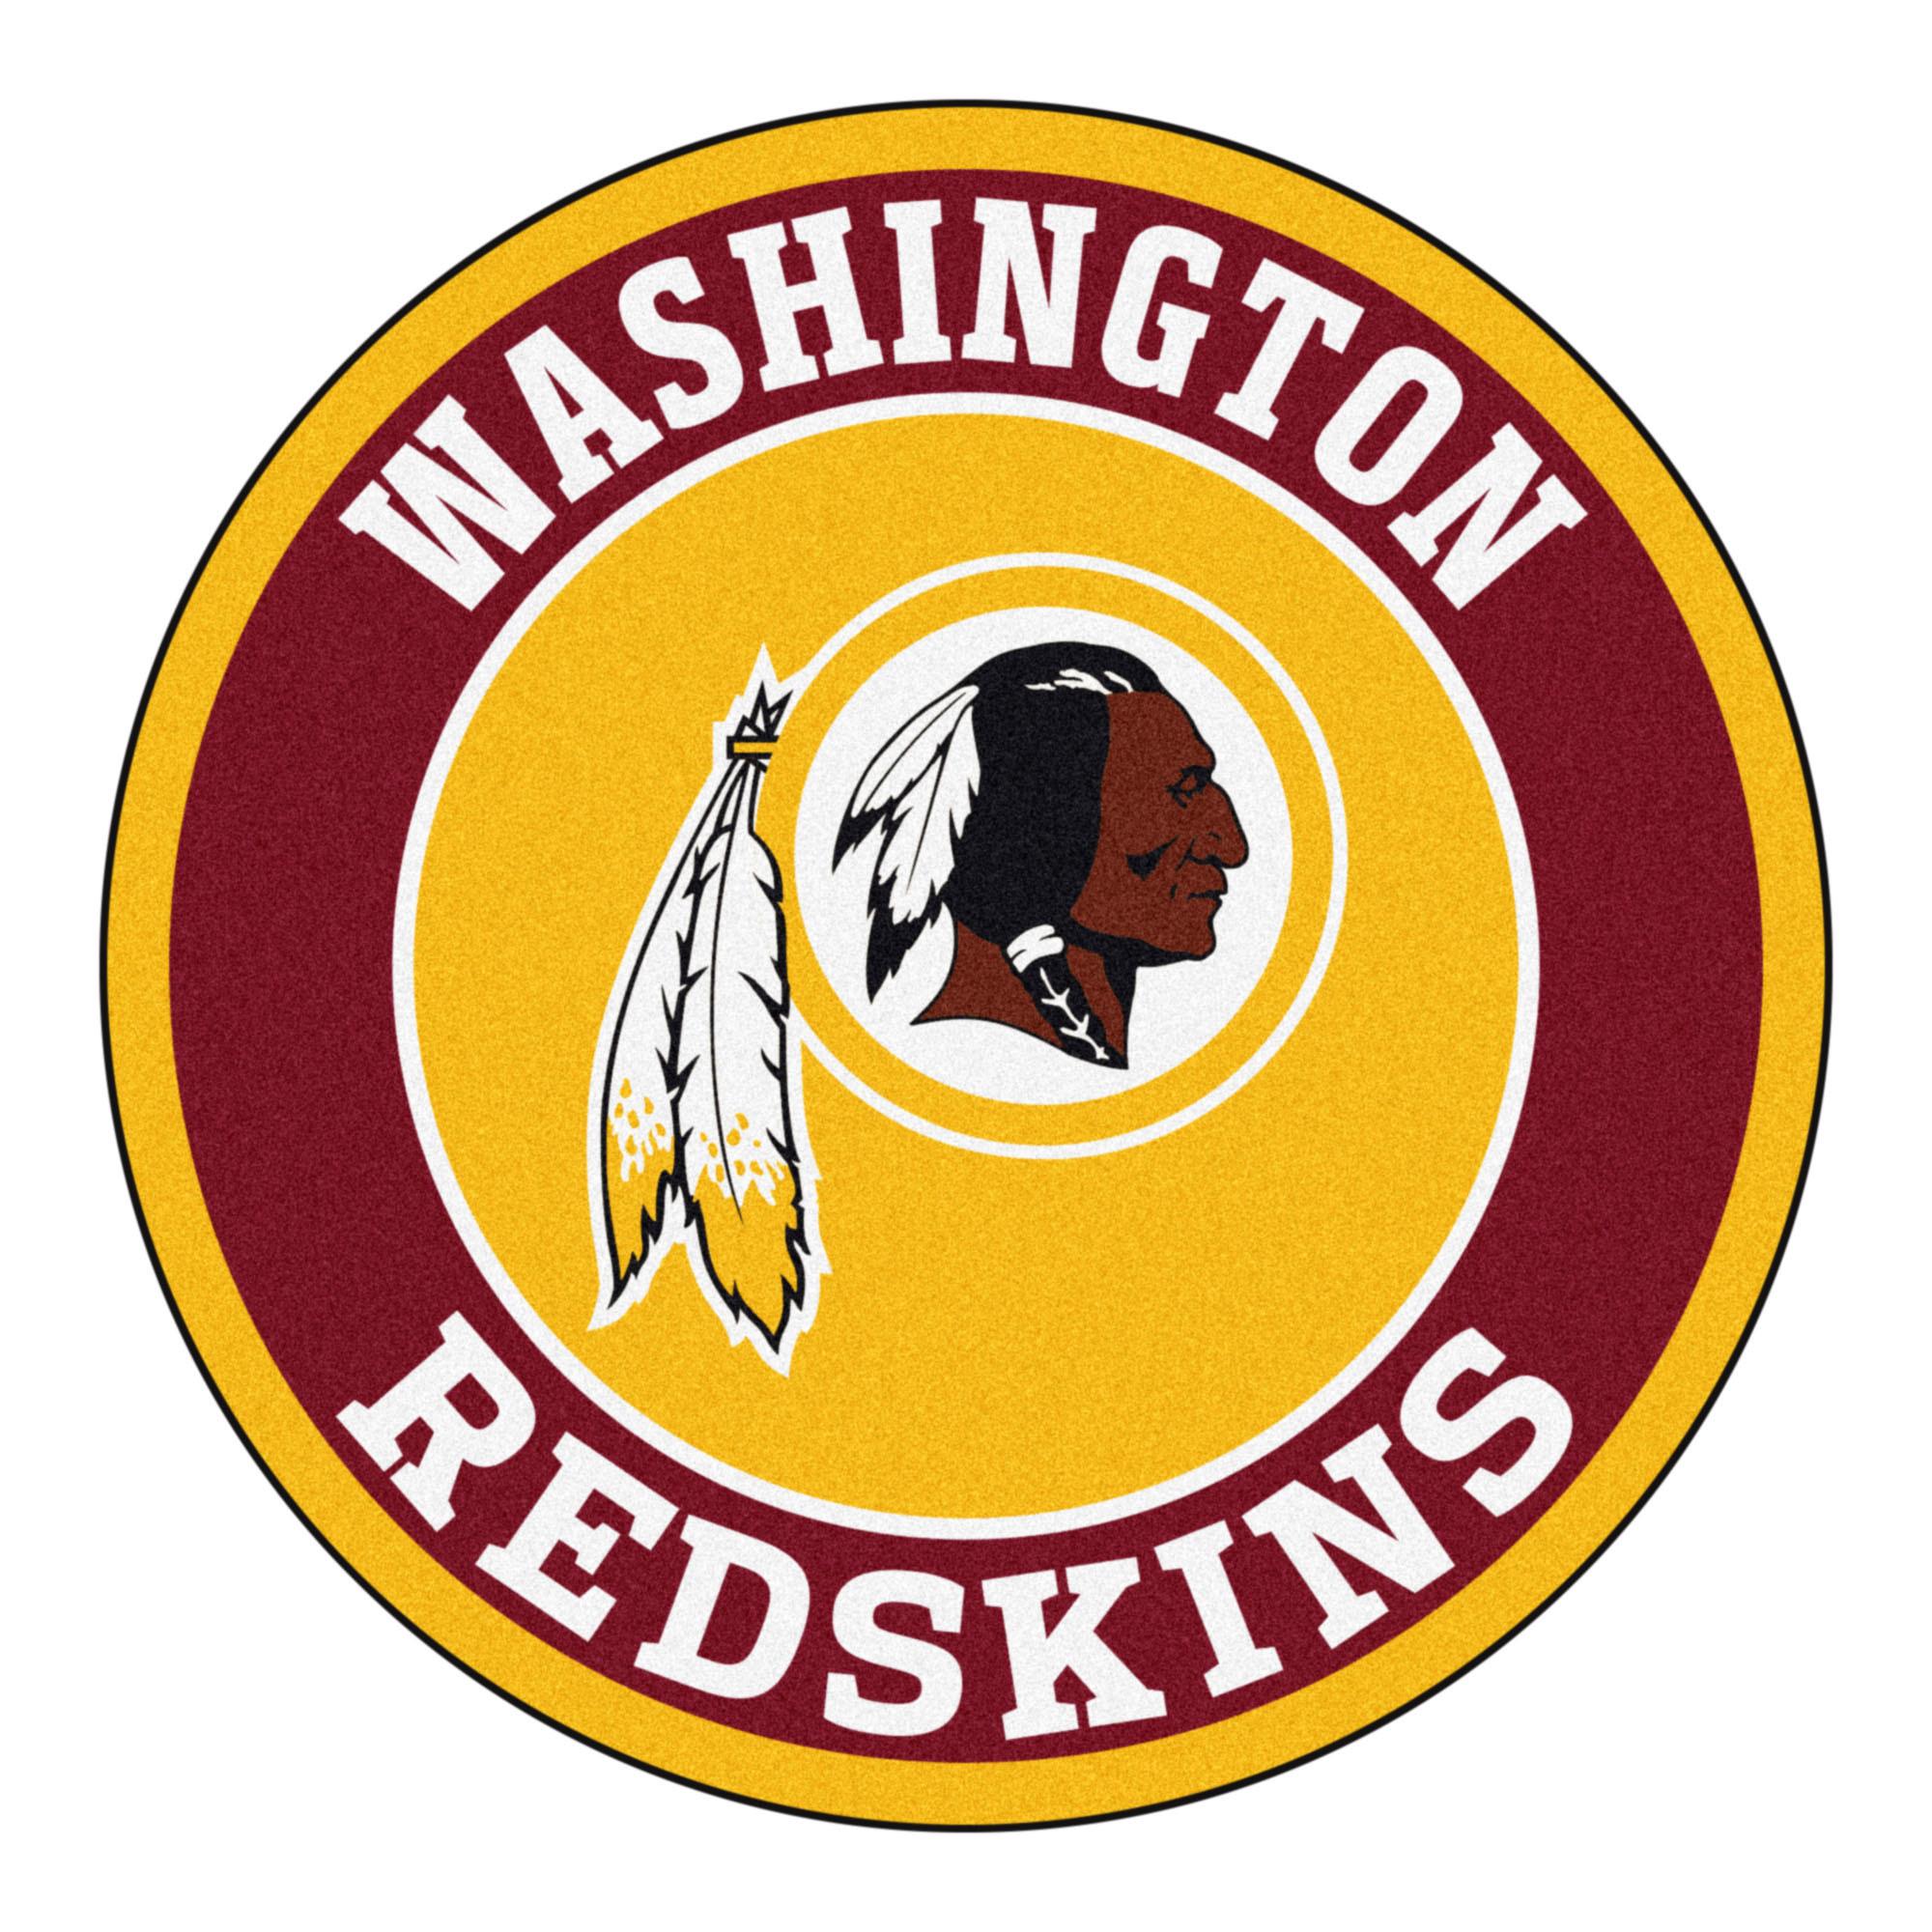 Hd Chiefs Wallpaper: Washington Redskins HD Wallpaper (70+ Images